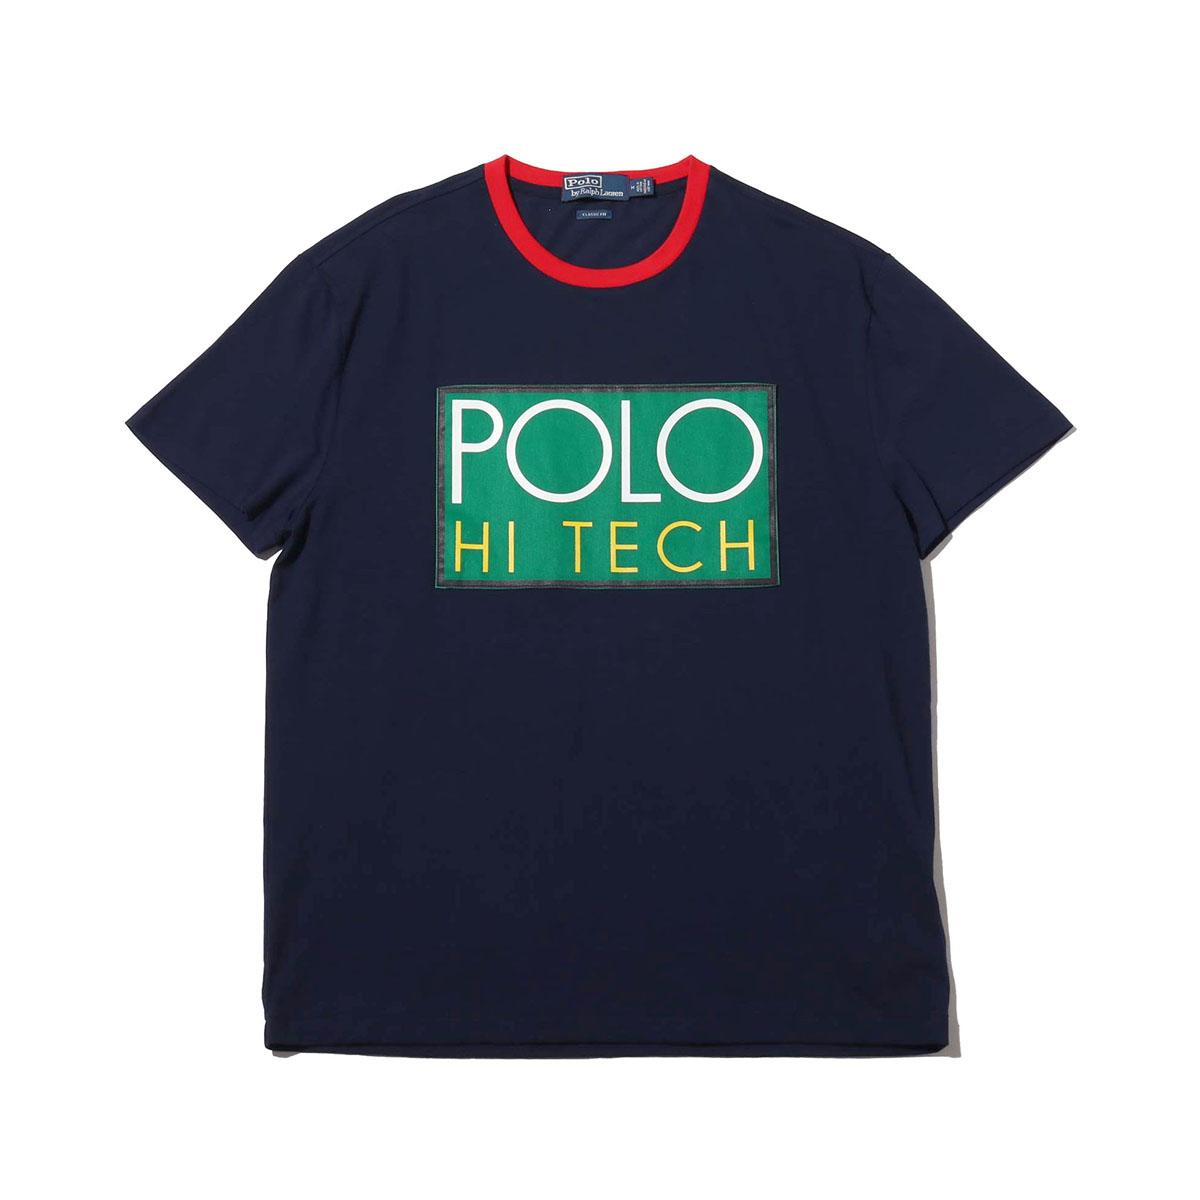 POLO RALPH LAUREN SSCNM1-SHORT SLEEVE-T-SHIRT(ポロ ラルフローレン SSCNM1 ショートスリーブ Tシャツ)NAVY【メンズ 半袖Tシャツ】18HO-I